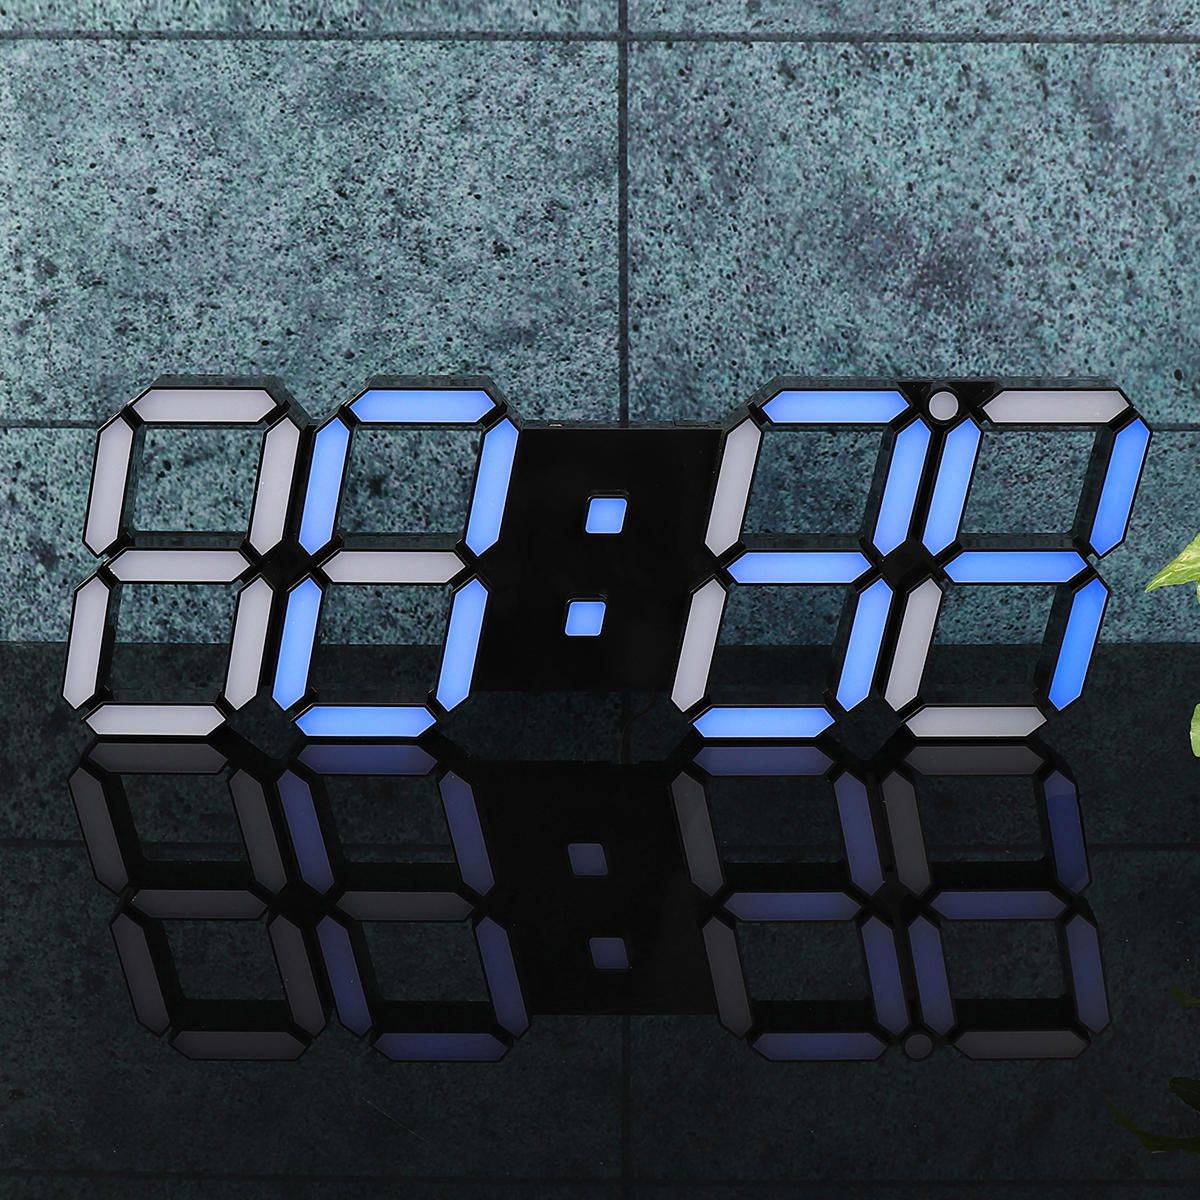 ODO US$63.07 39×13×2.2cm 3D Digital LED Wall Clock Alarm Watch Temperature Modern USB Remote Control